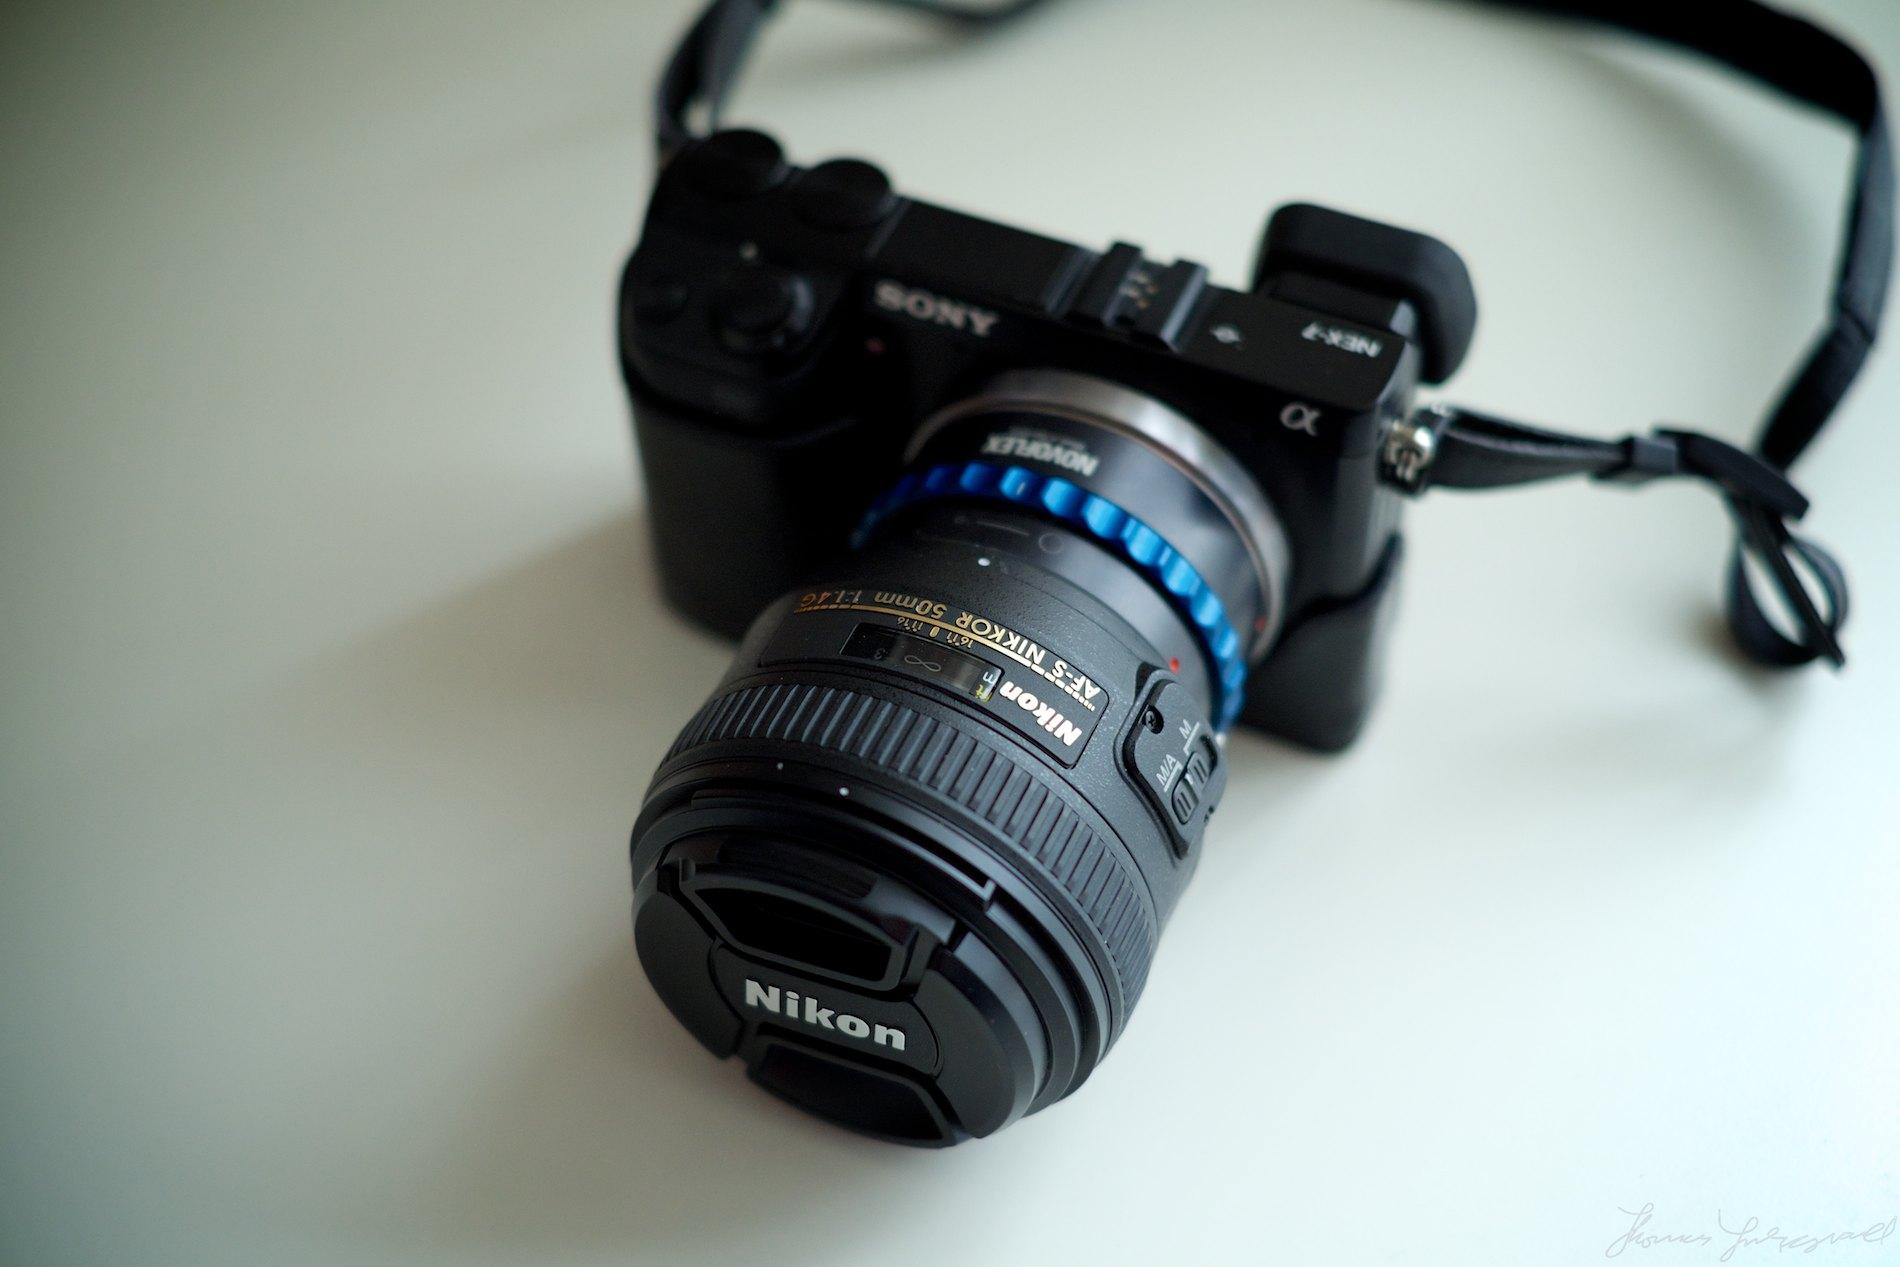 Sony-Nex-7-and-nikon-lens1